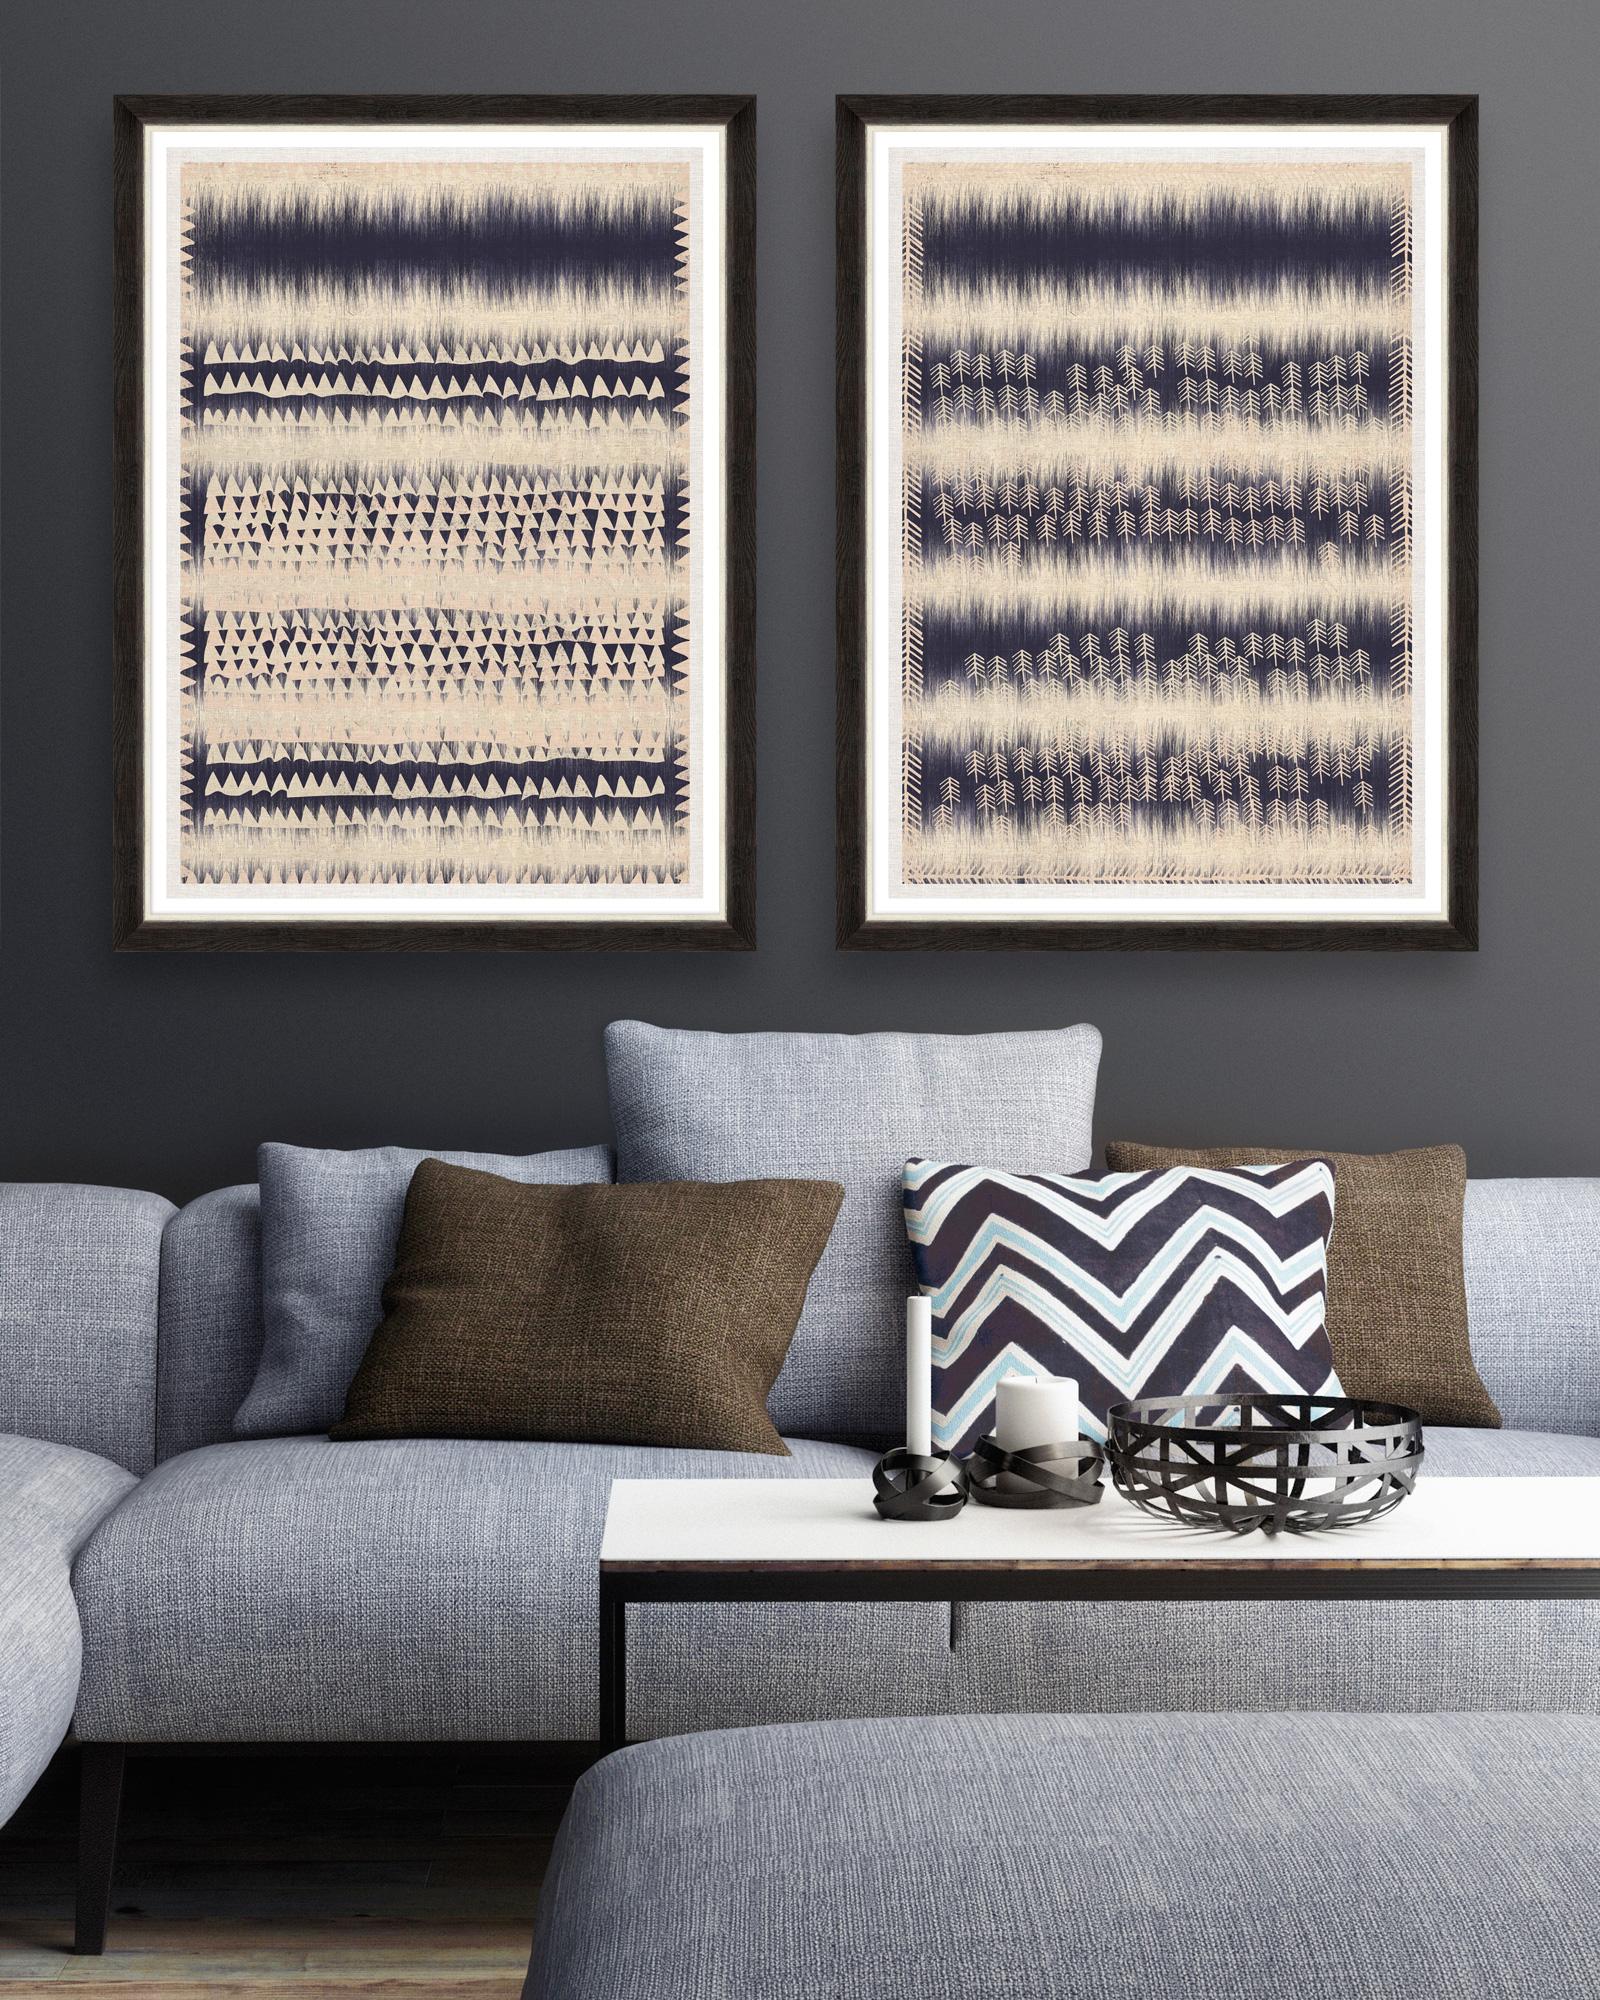 Tablou 2 piese Framed Art Indigo Patterns imagine